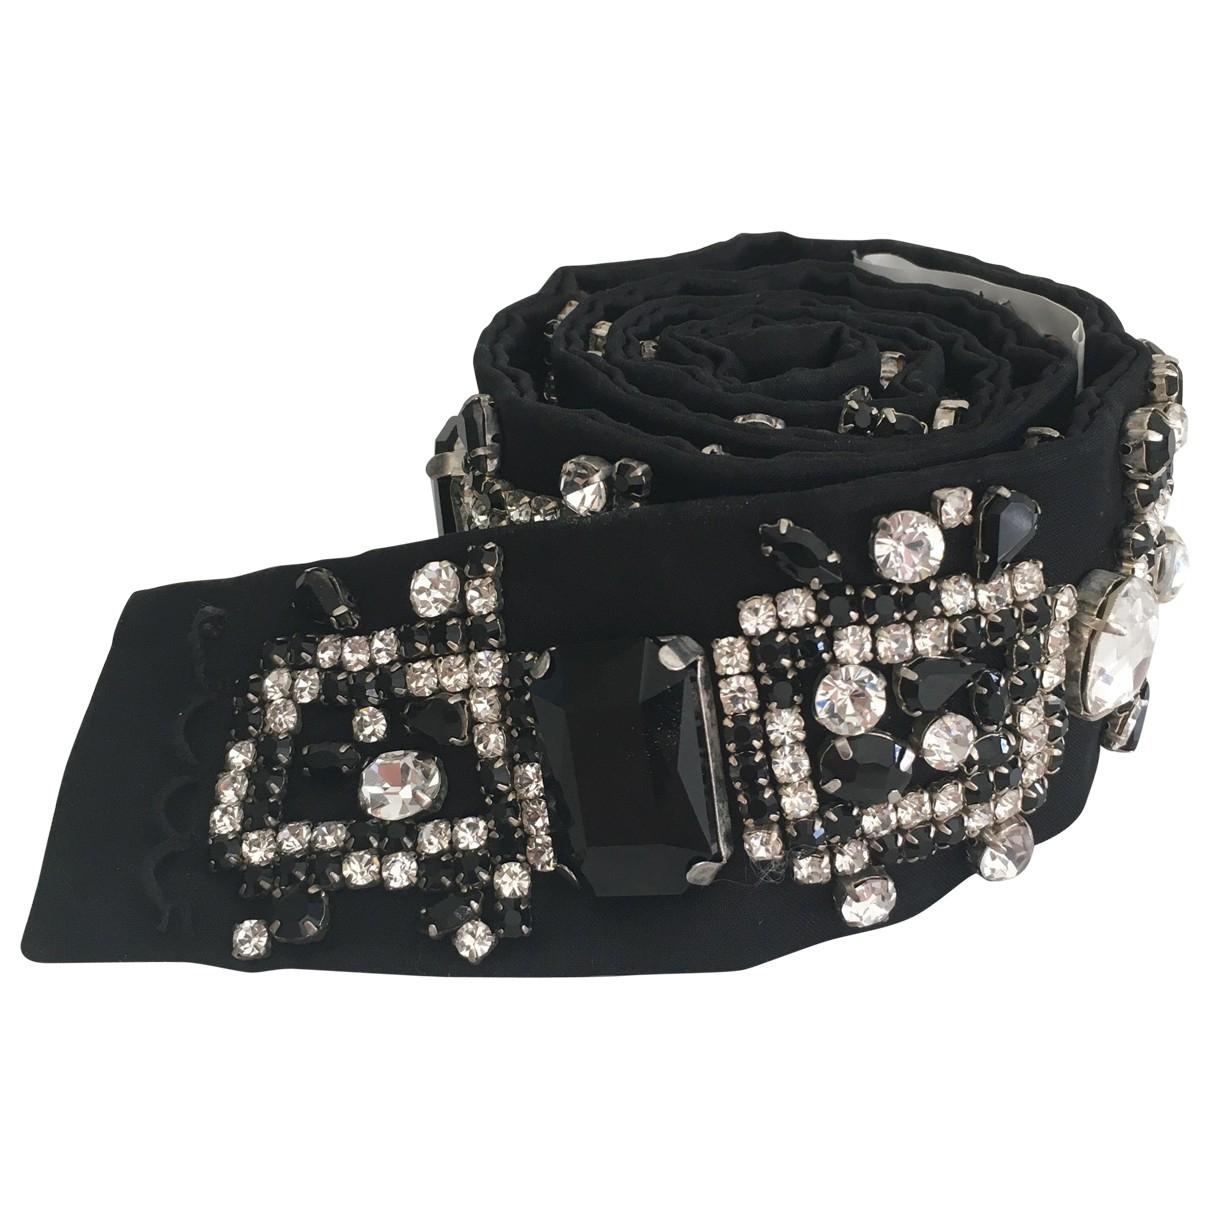 Cinturon de Seda Yves Saint Laurent